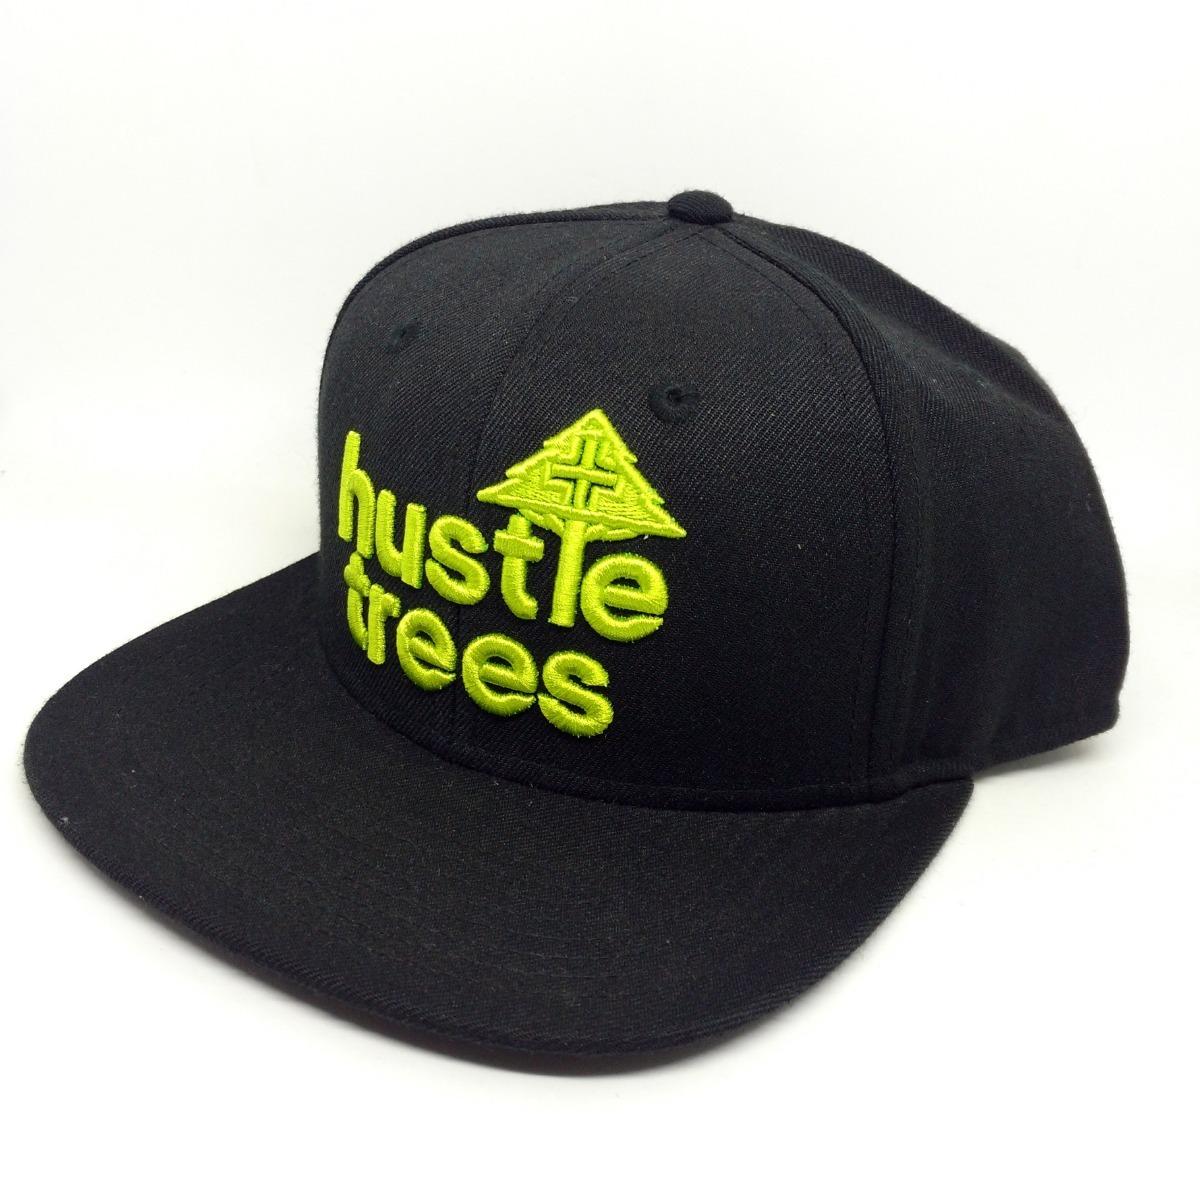 boné lrg hustle trees snapback preto. Carregando zoom. e789241b020